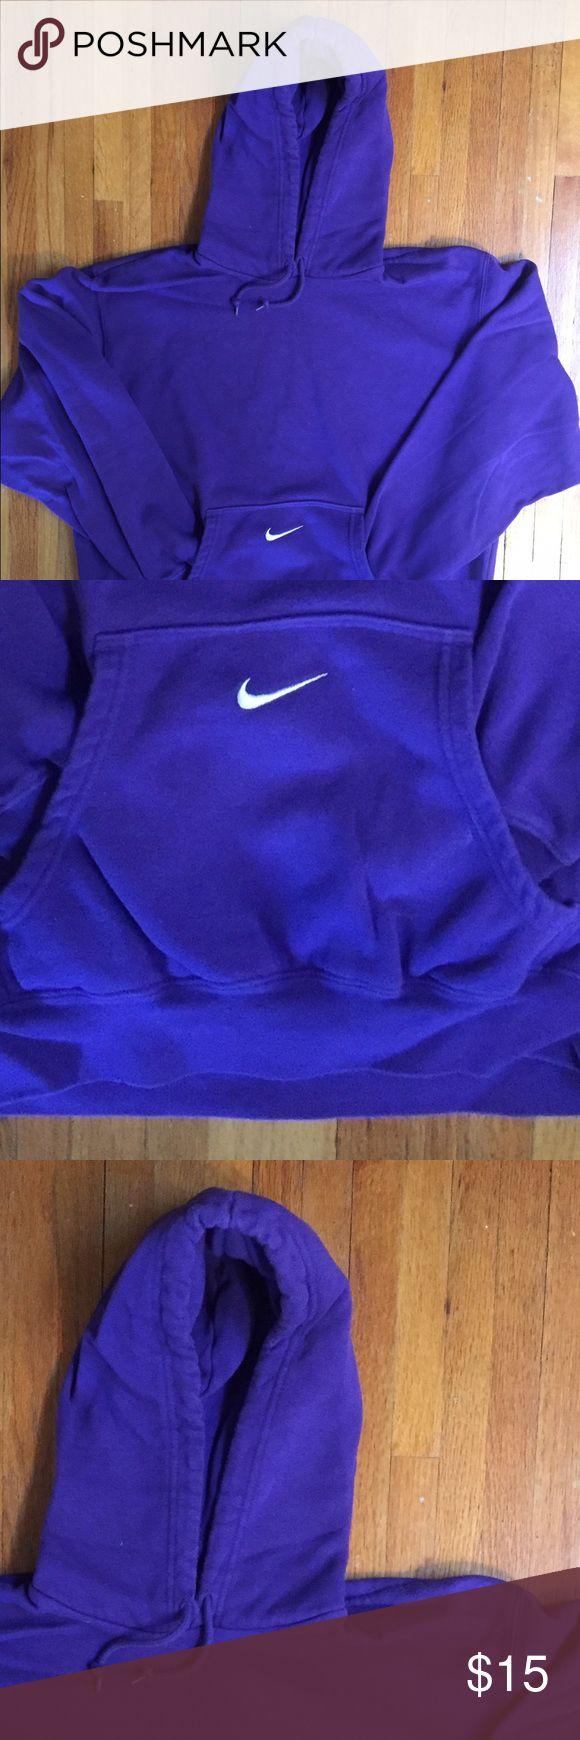 Nike purple hoodie Nike purple hoodie Nike Shirts Sweatshirts & Hoodies